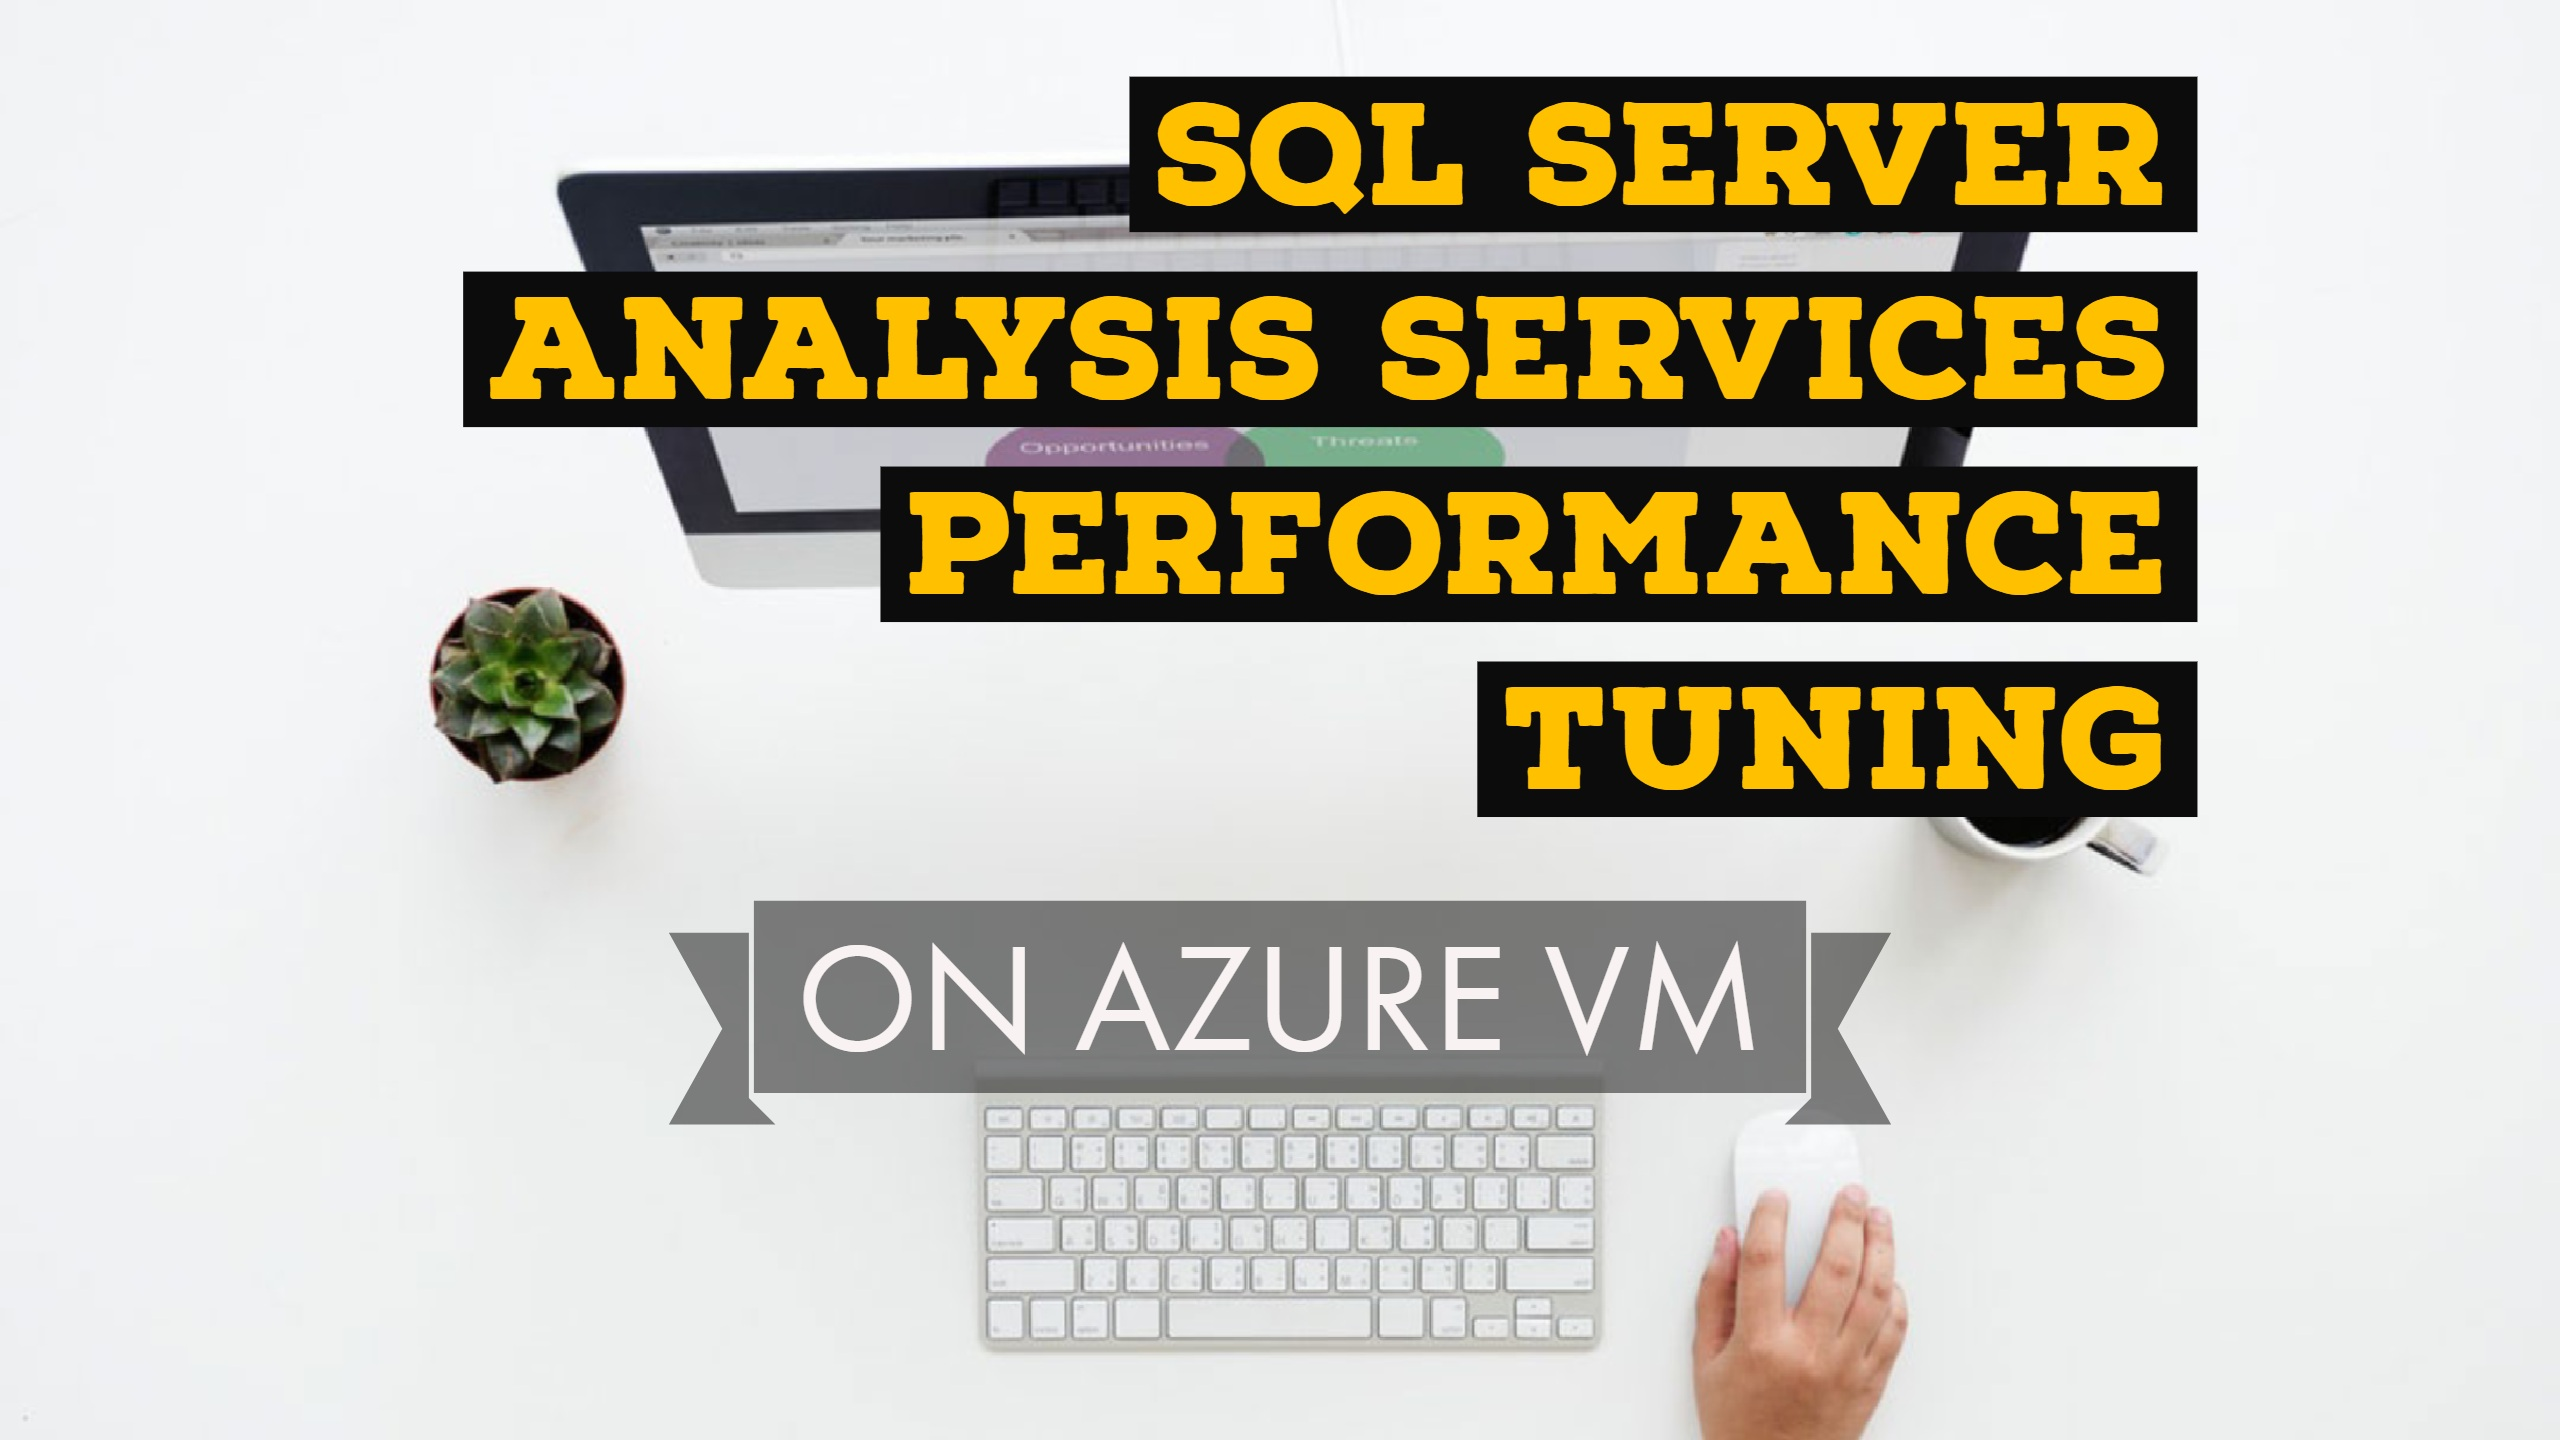 SQL Server Analysis Services Performance Tuning on Azure Virtual Machines